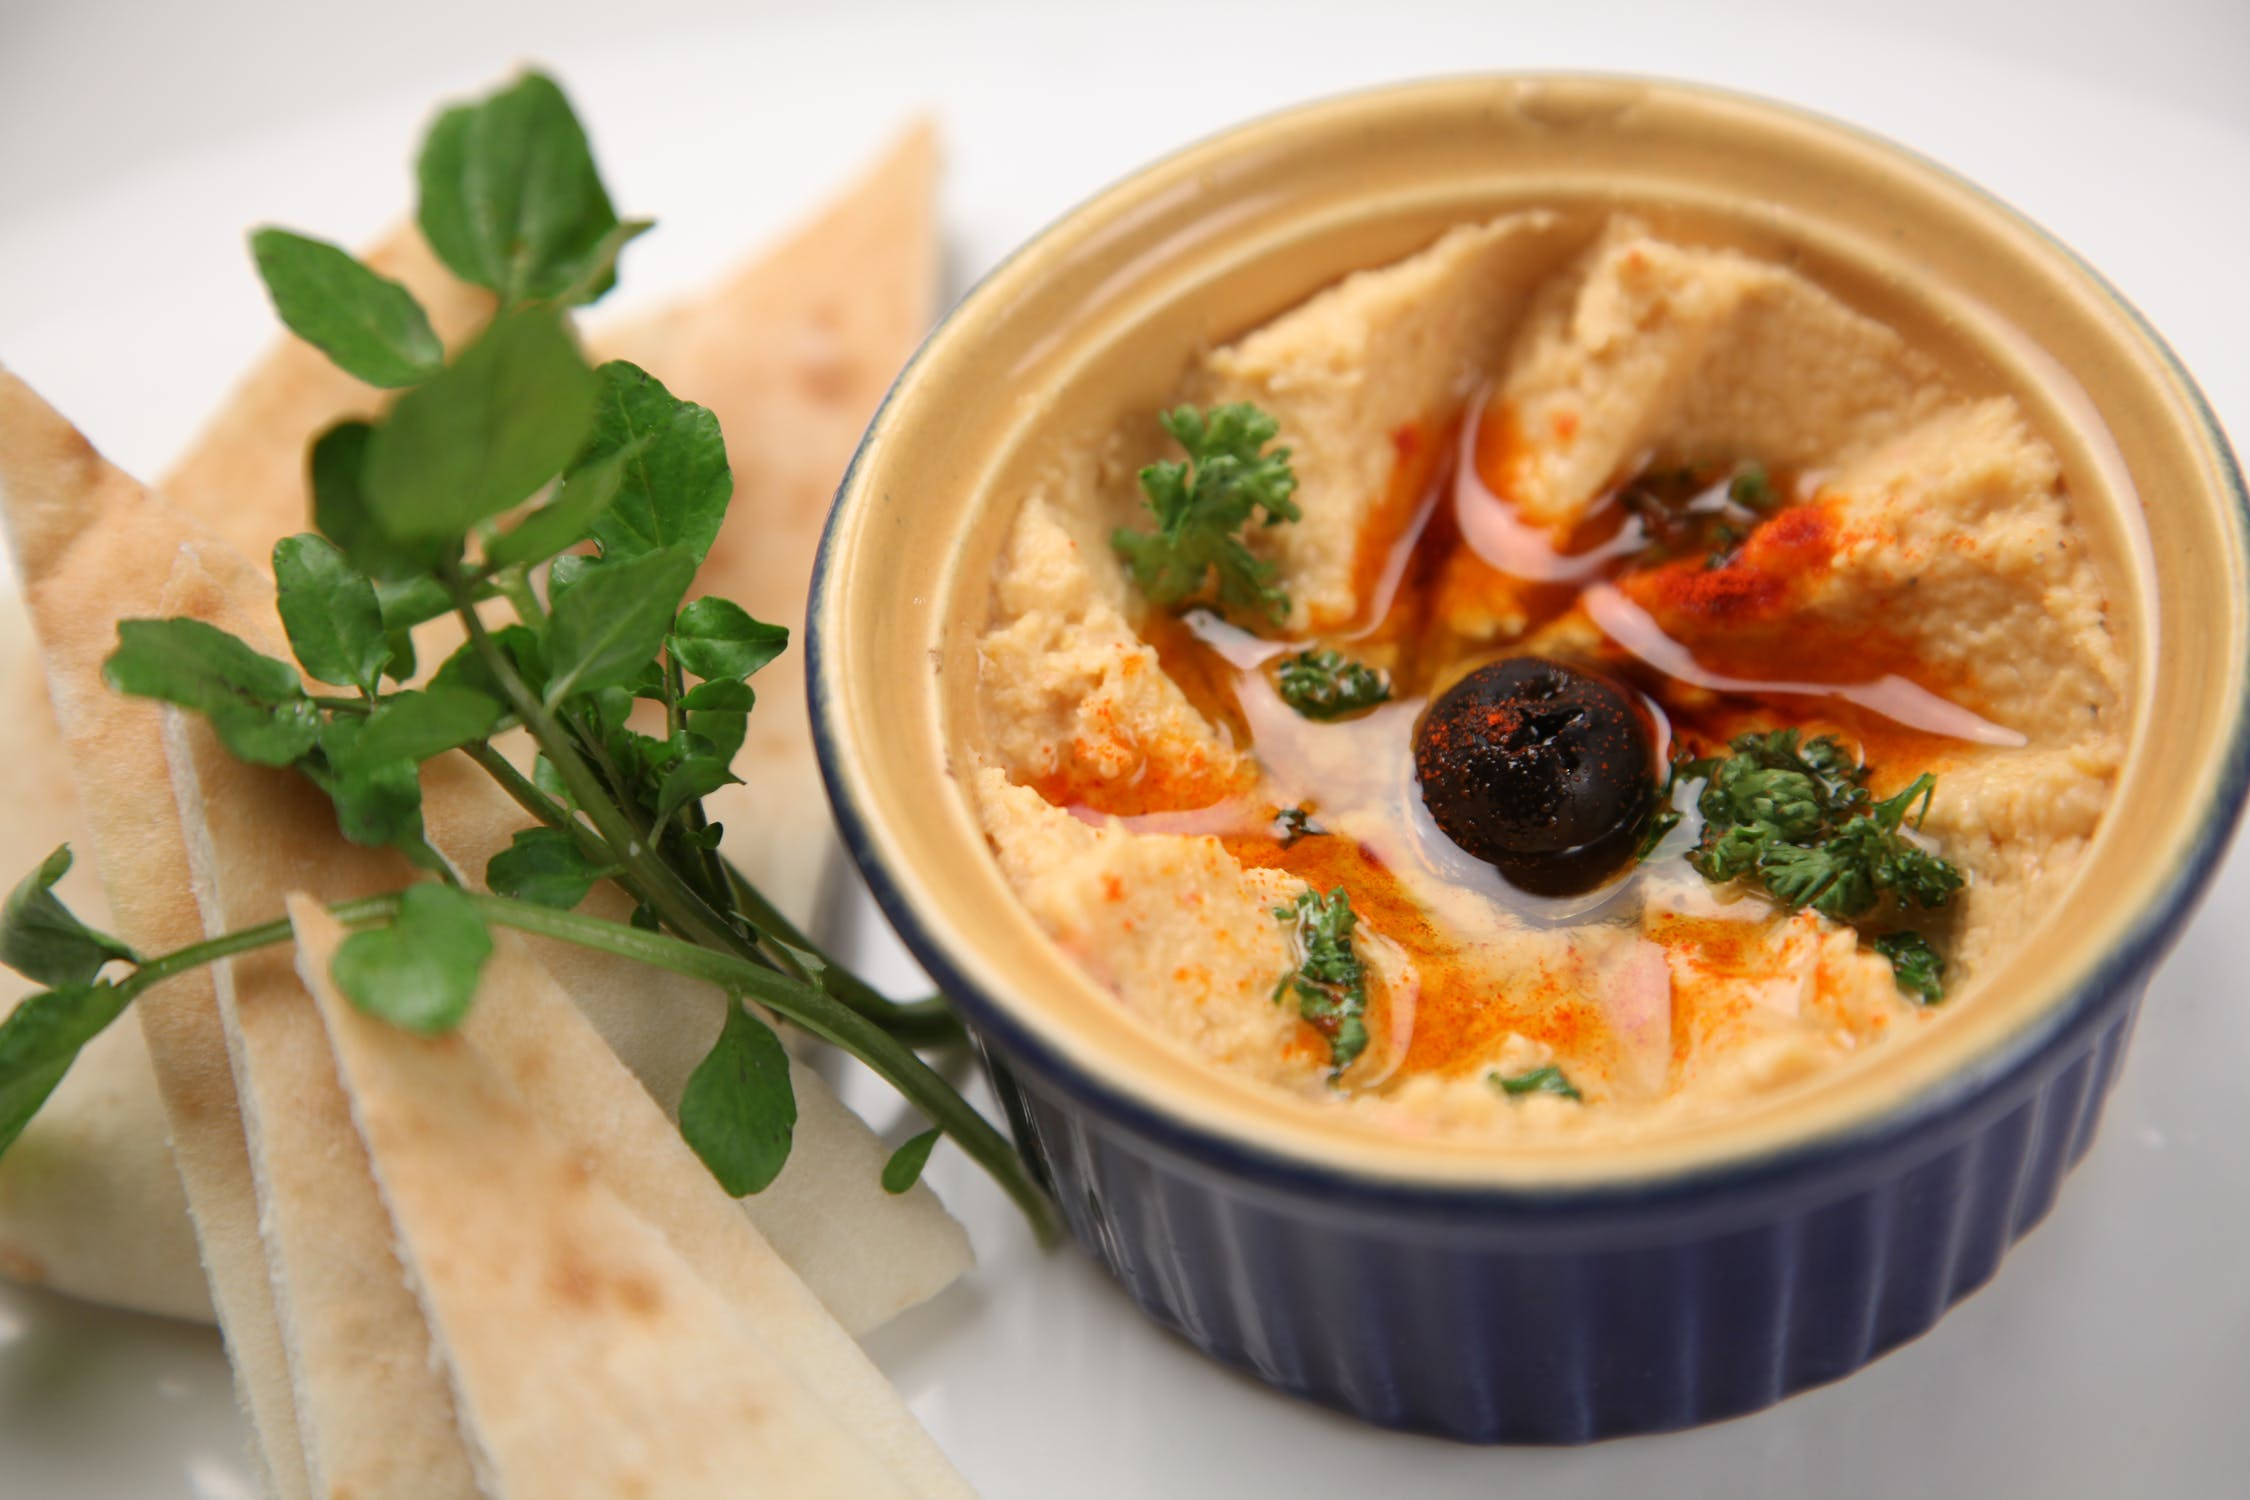 Hummus olive dip